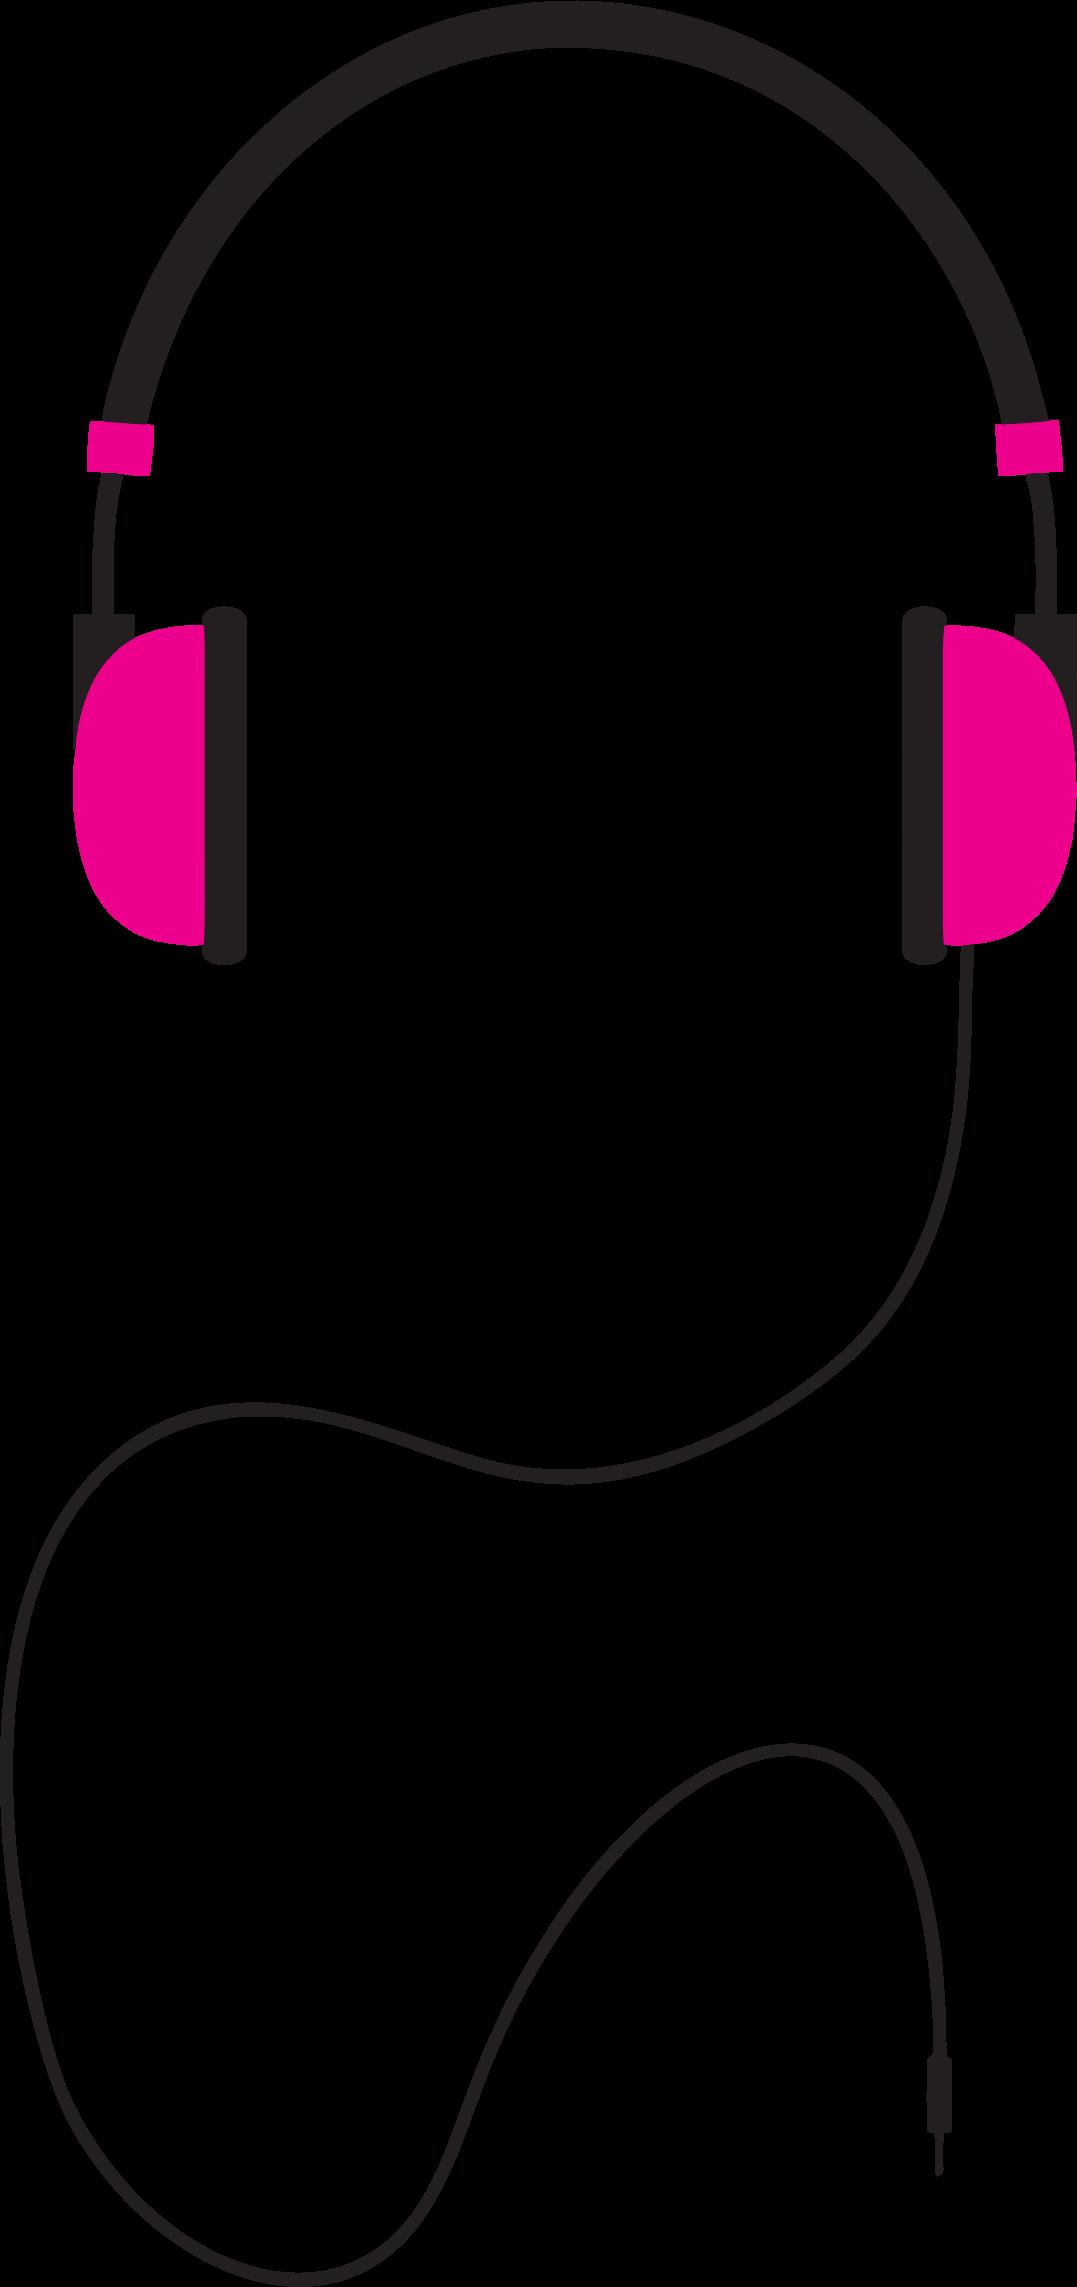 Headphones clipart logo. Illustration big image png